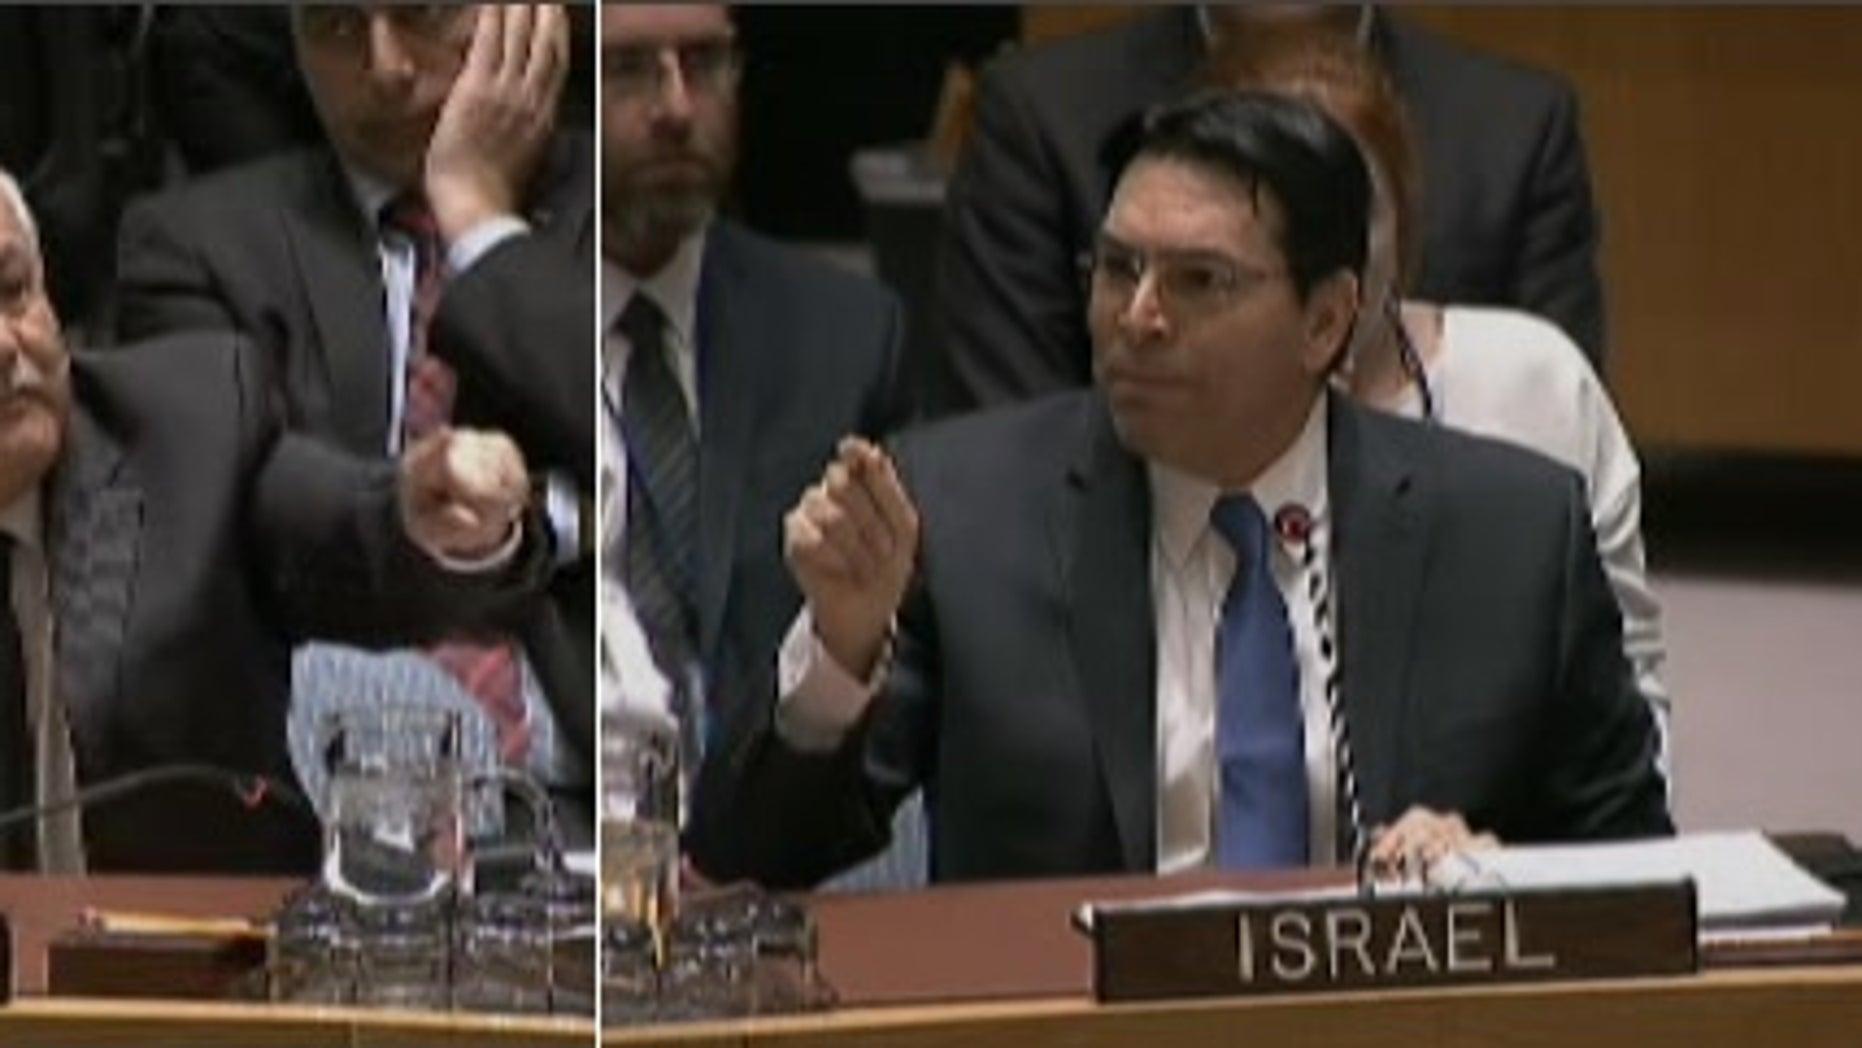 Palestinian ambassador Riyad Mansour, left, and Israeli Ambassador Danny Danon.